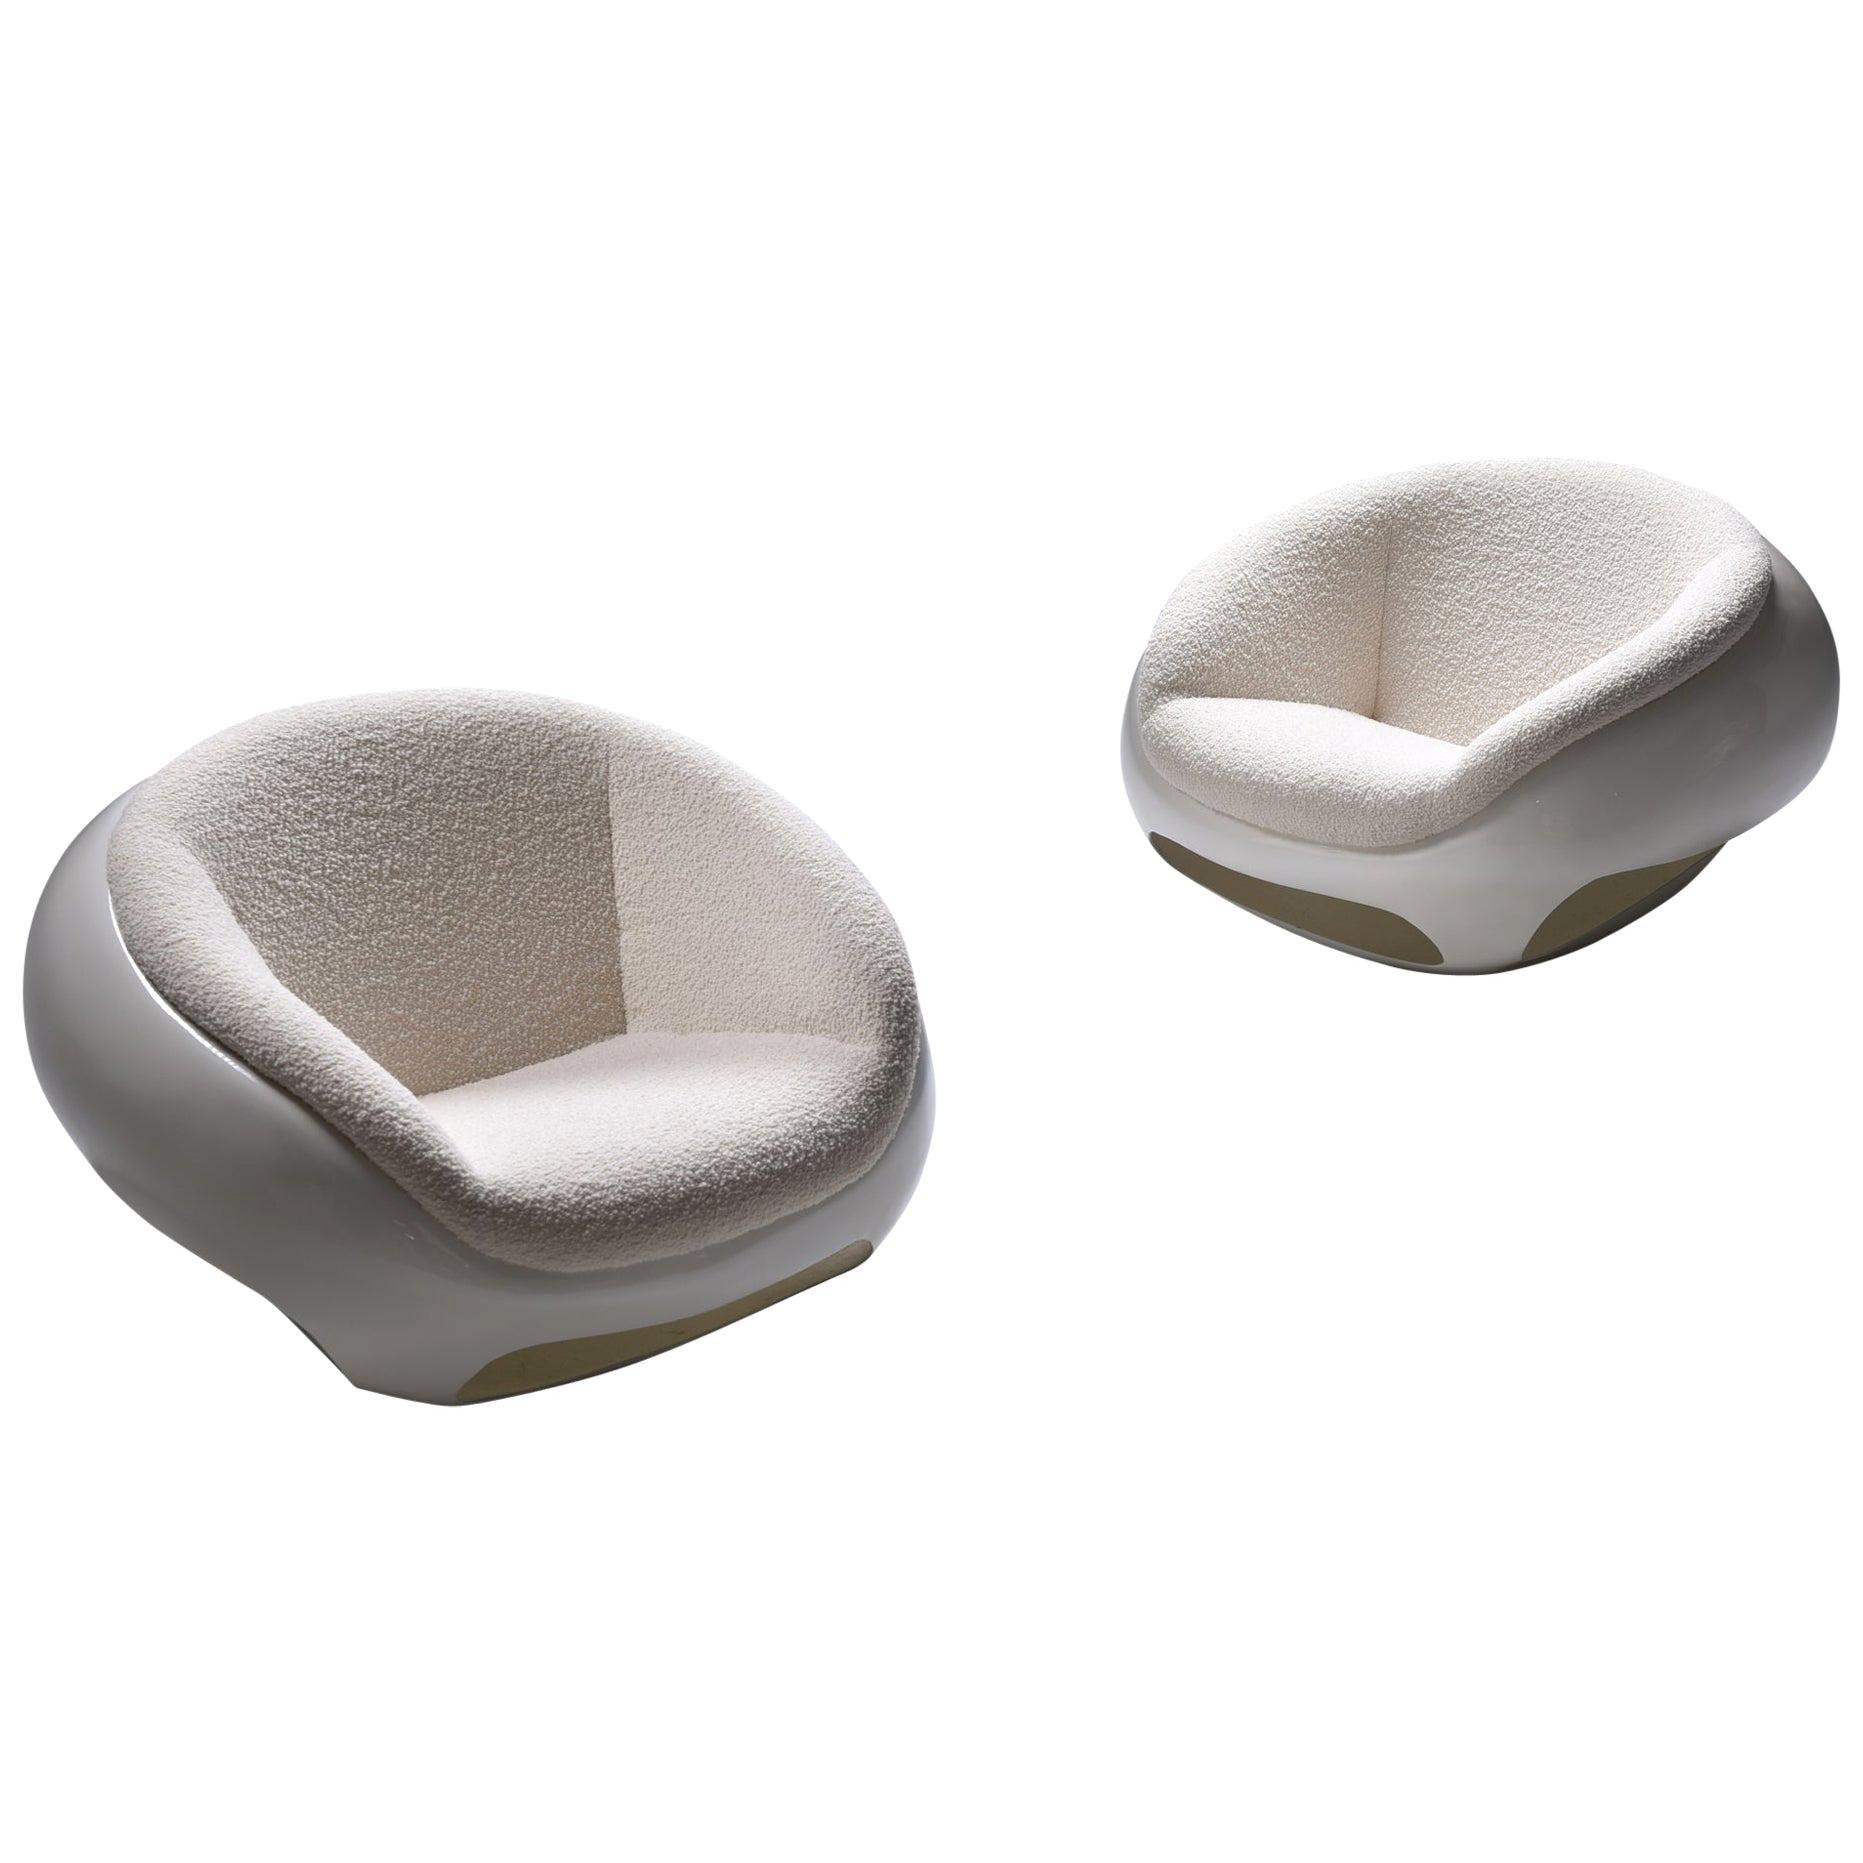 Mario Sabot Sculptural Fiberglass Lounge Chairs in Bouclé